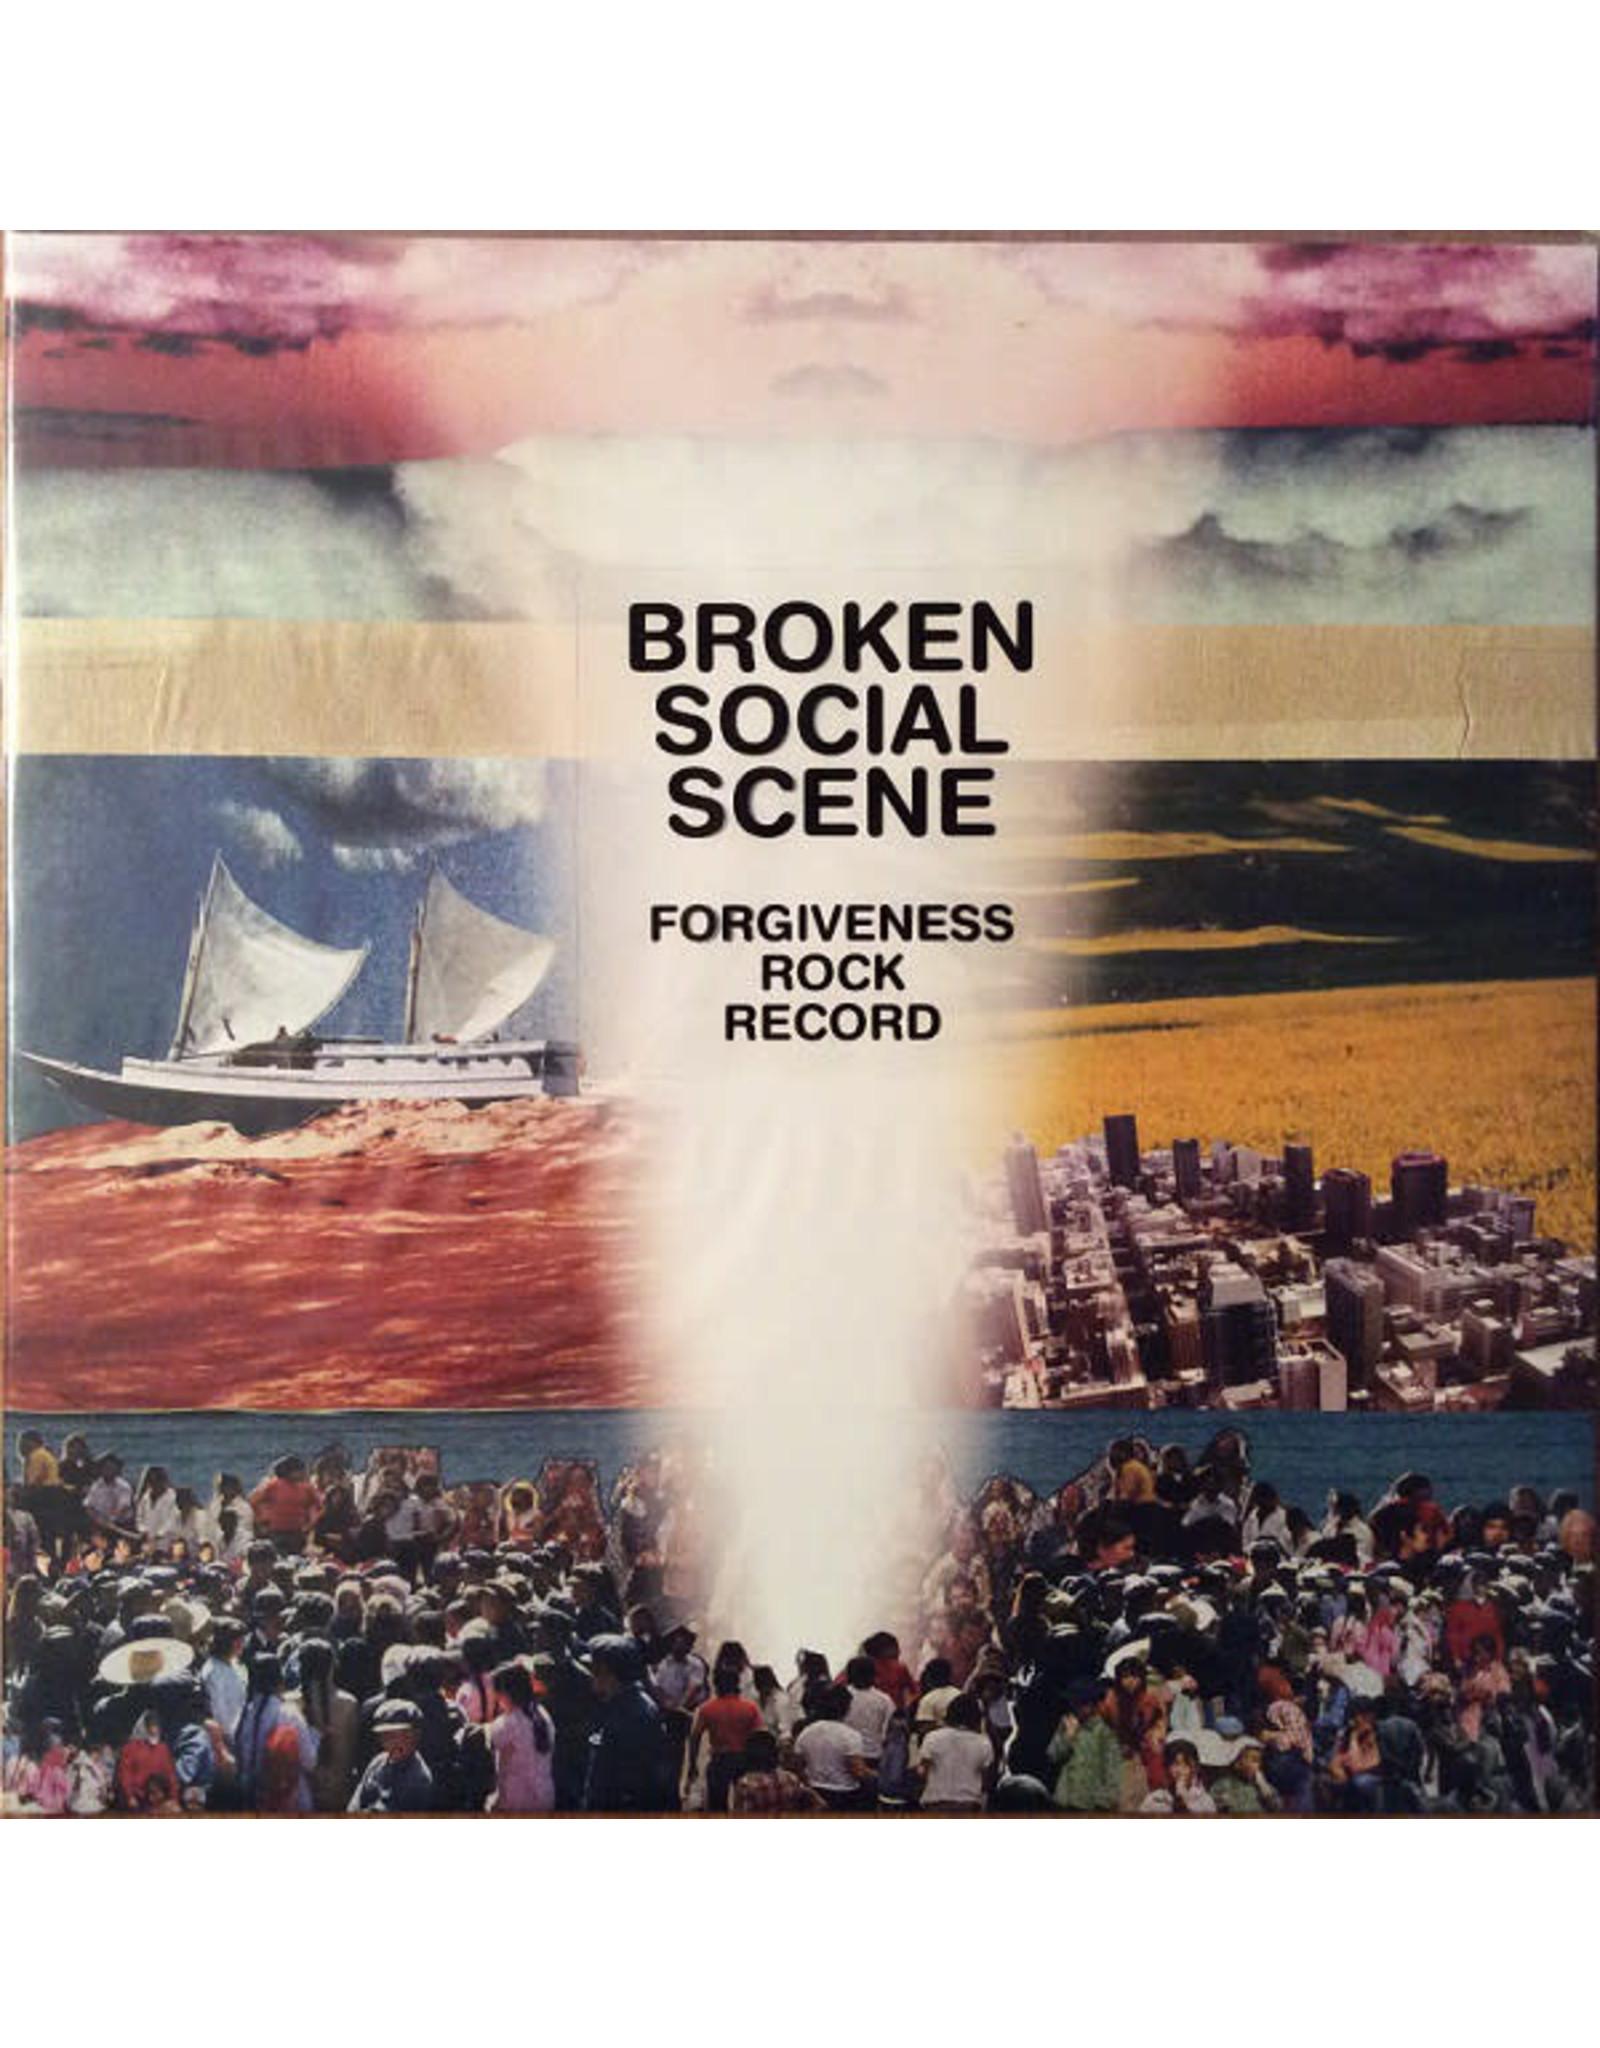 Broken Social Scene - Forgiveness Rock Record